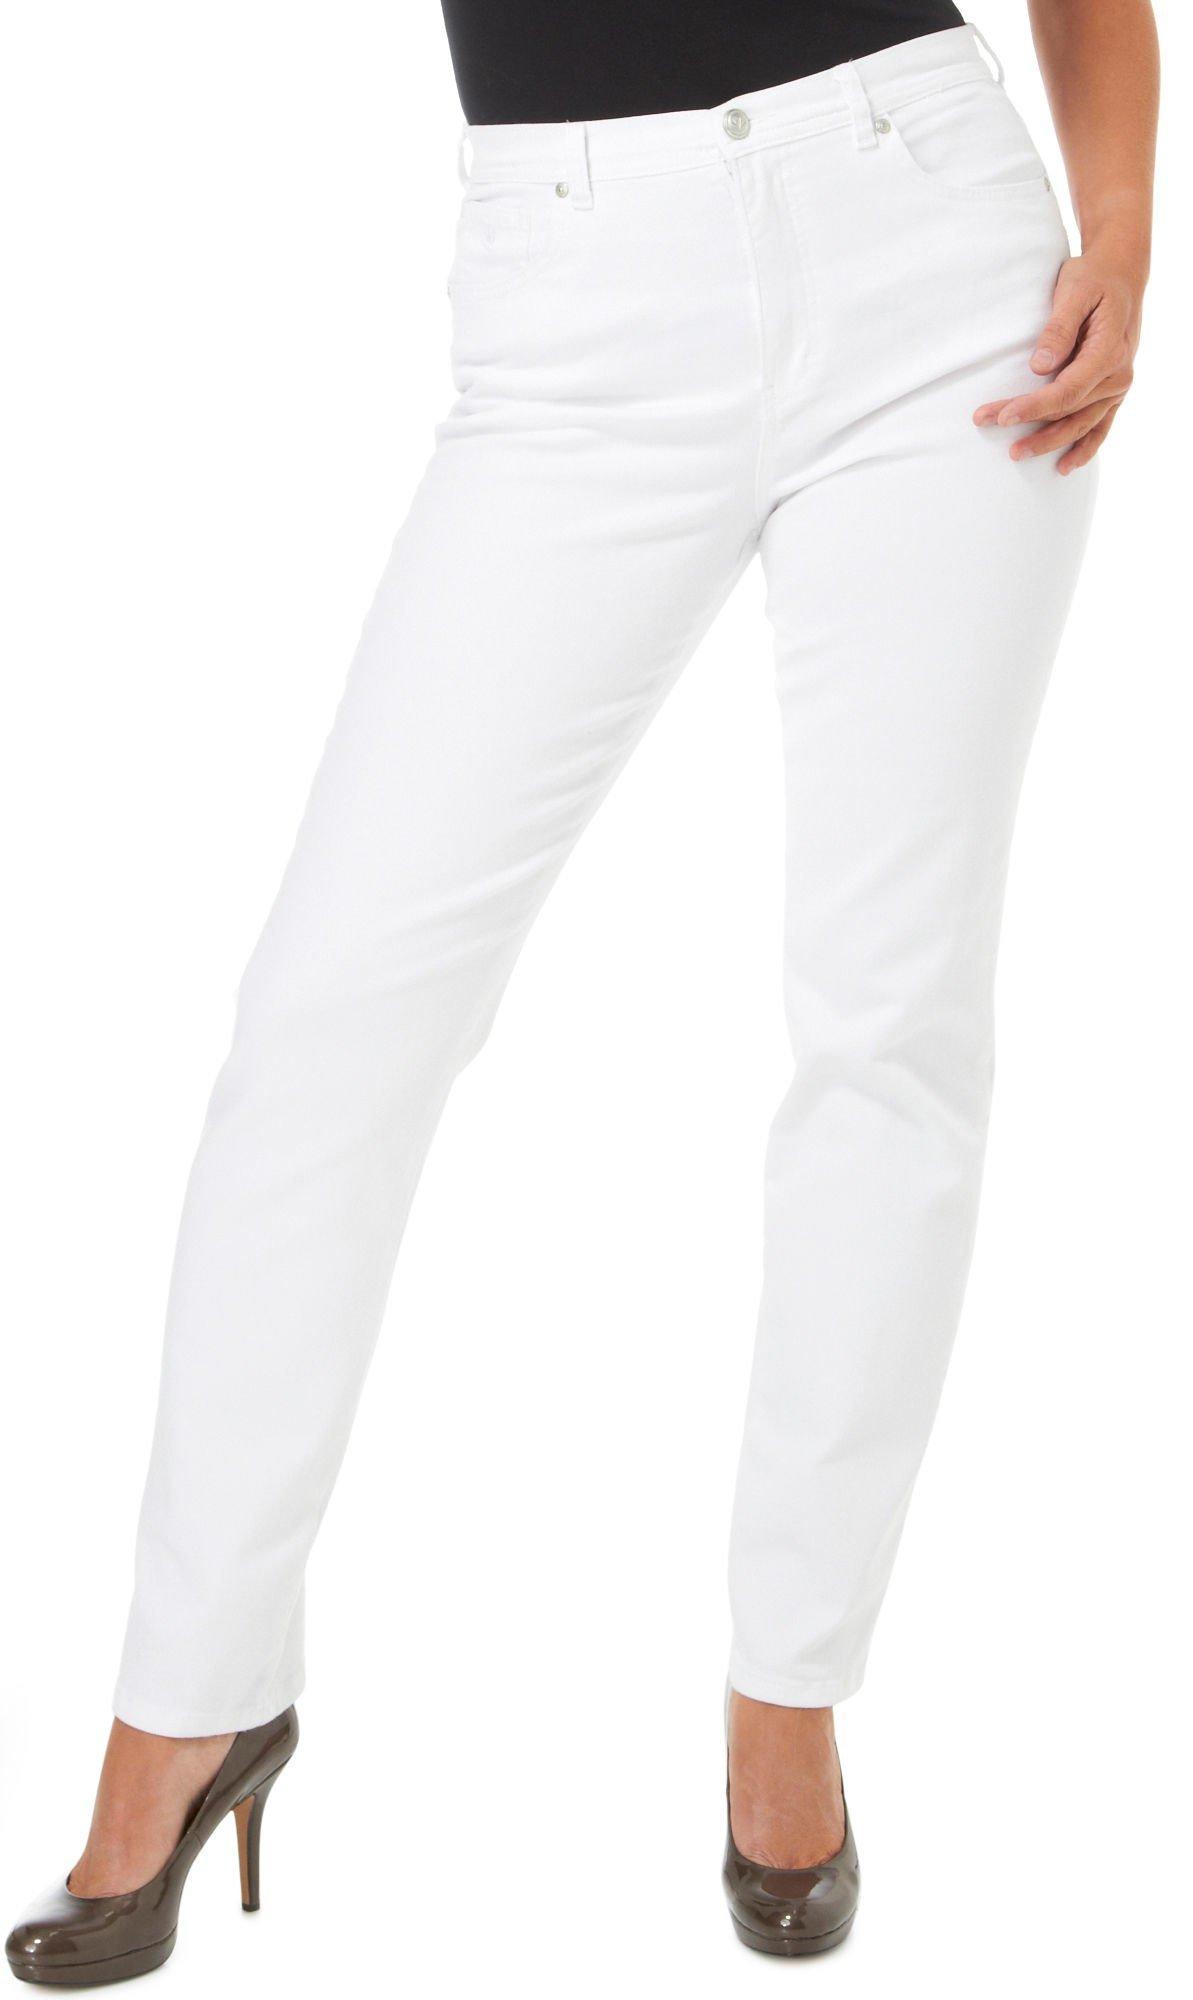 Gloria vanderbilt petite skinny jeans